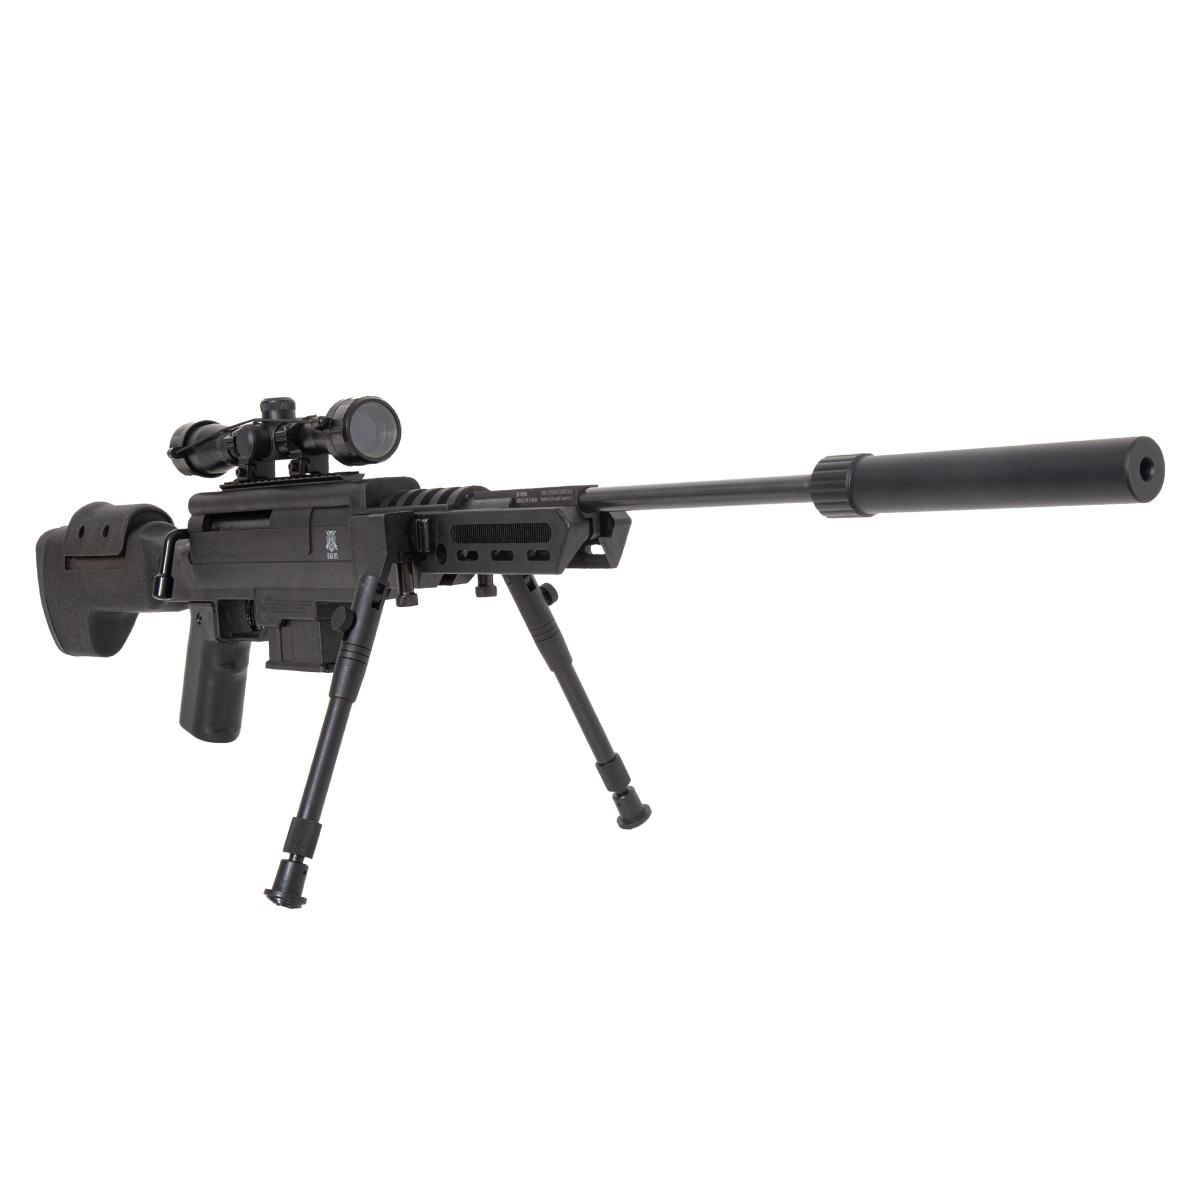 Carabina de Pressão SAG Black OPS Sniper 5.5mm Gás Ram